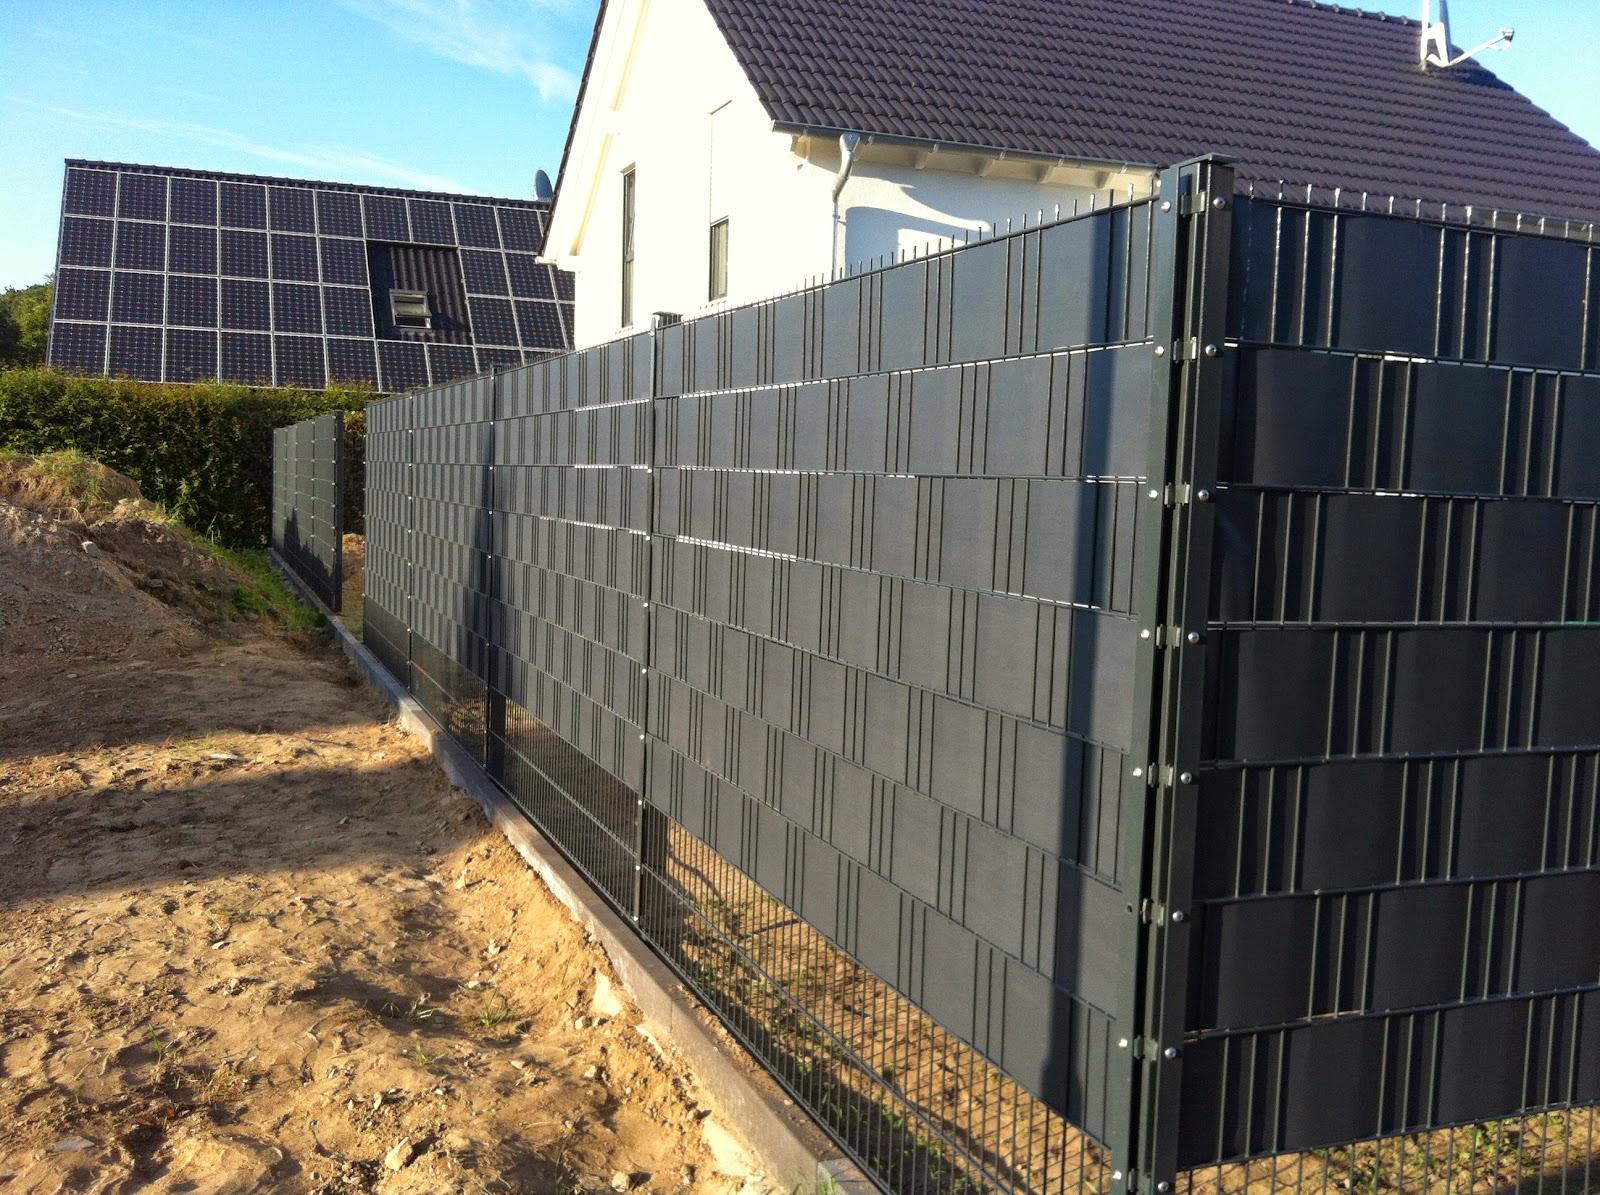 Terrasse Bauen Unterbau RT07 – Hitoiro